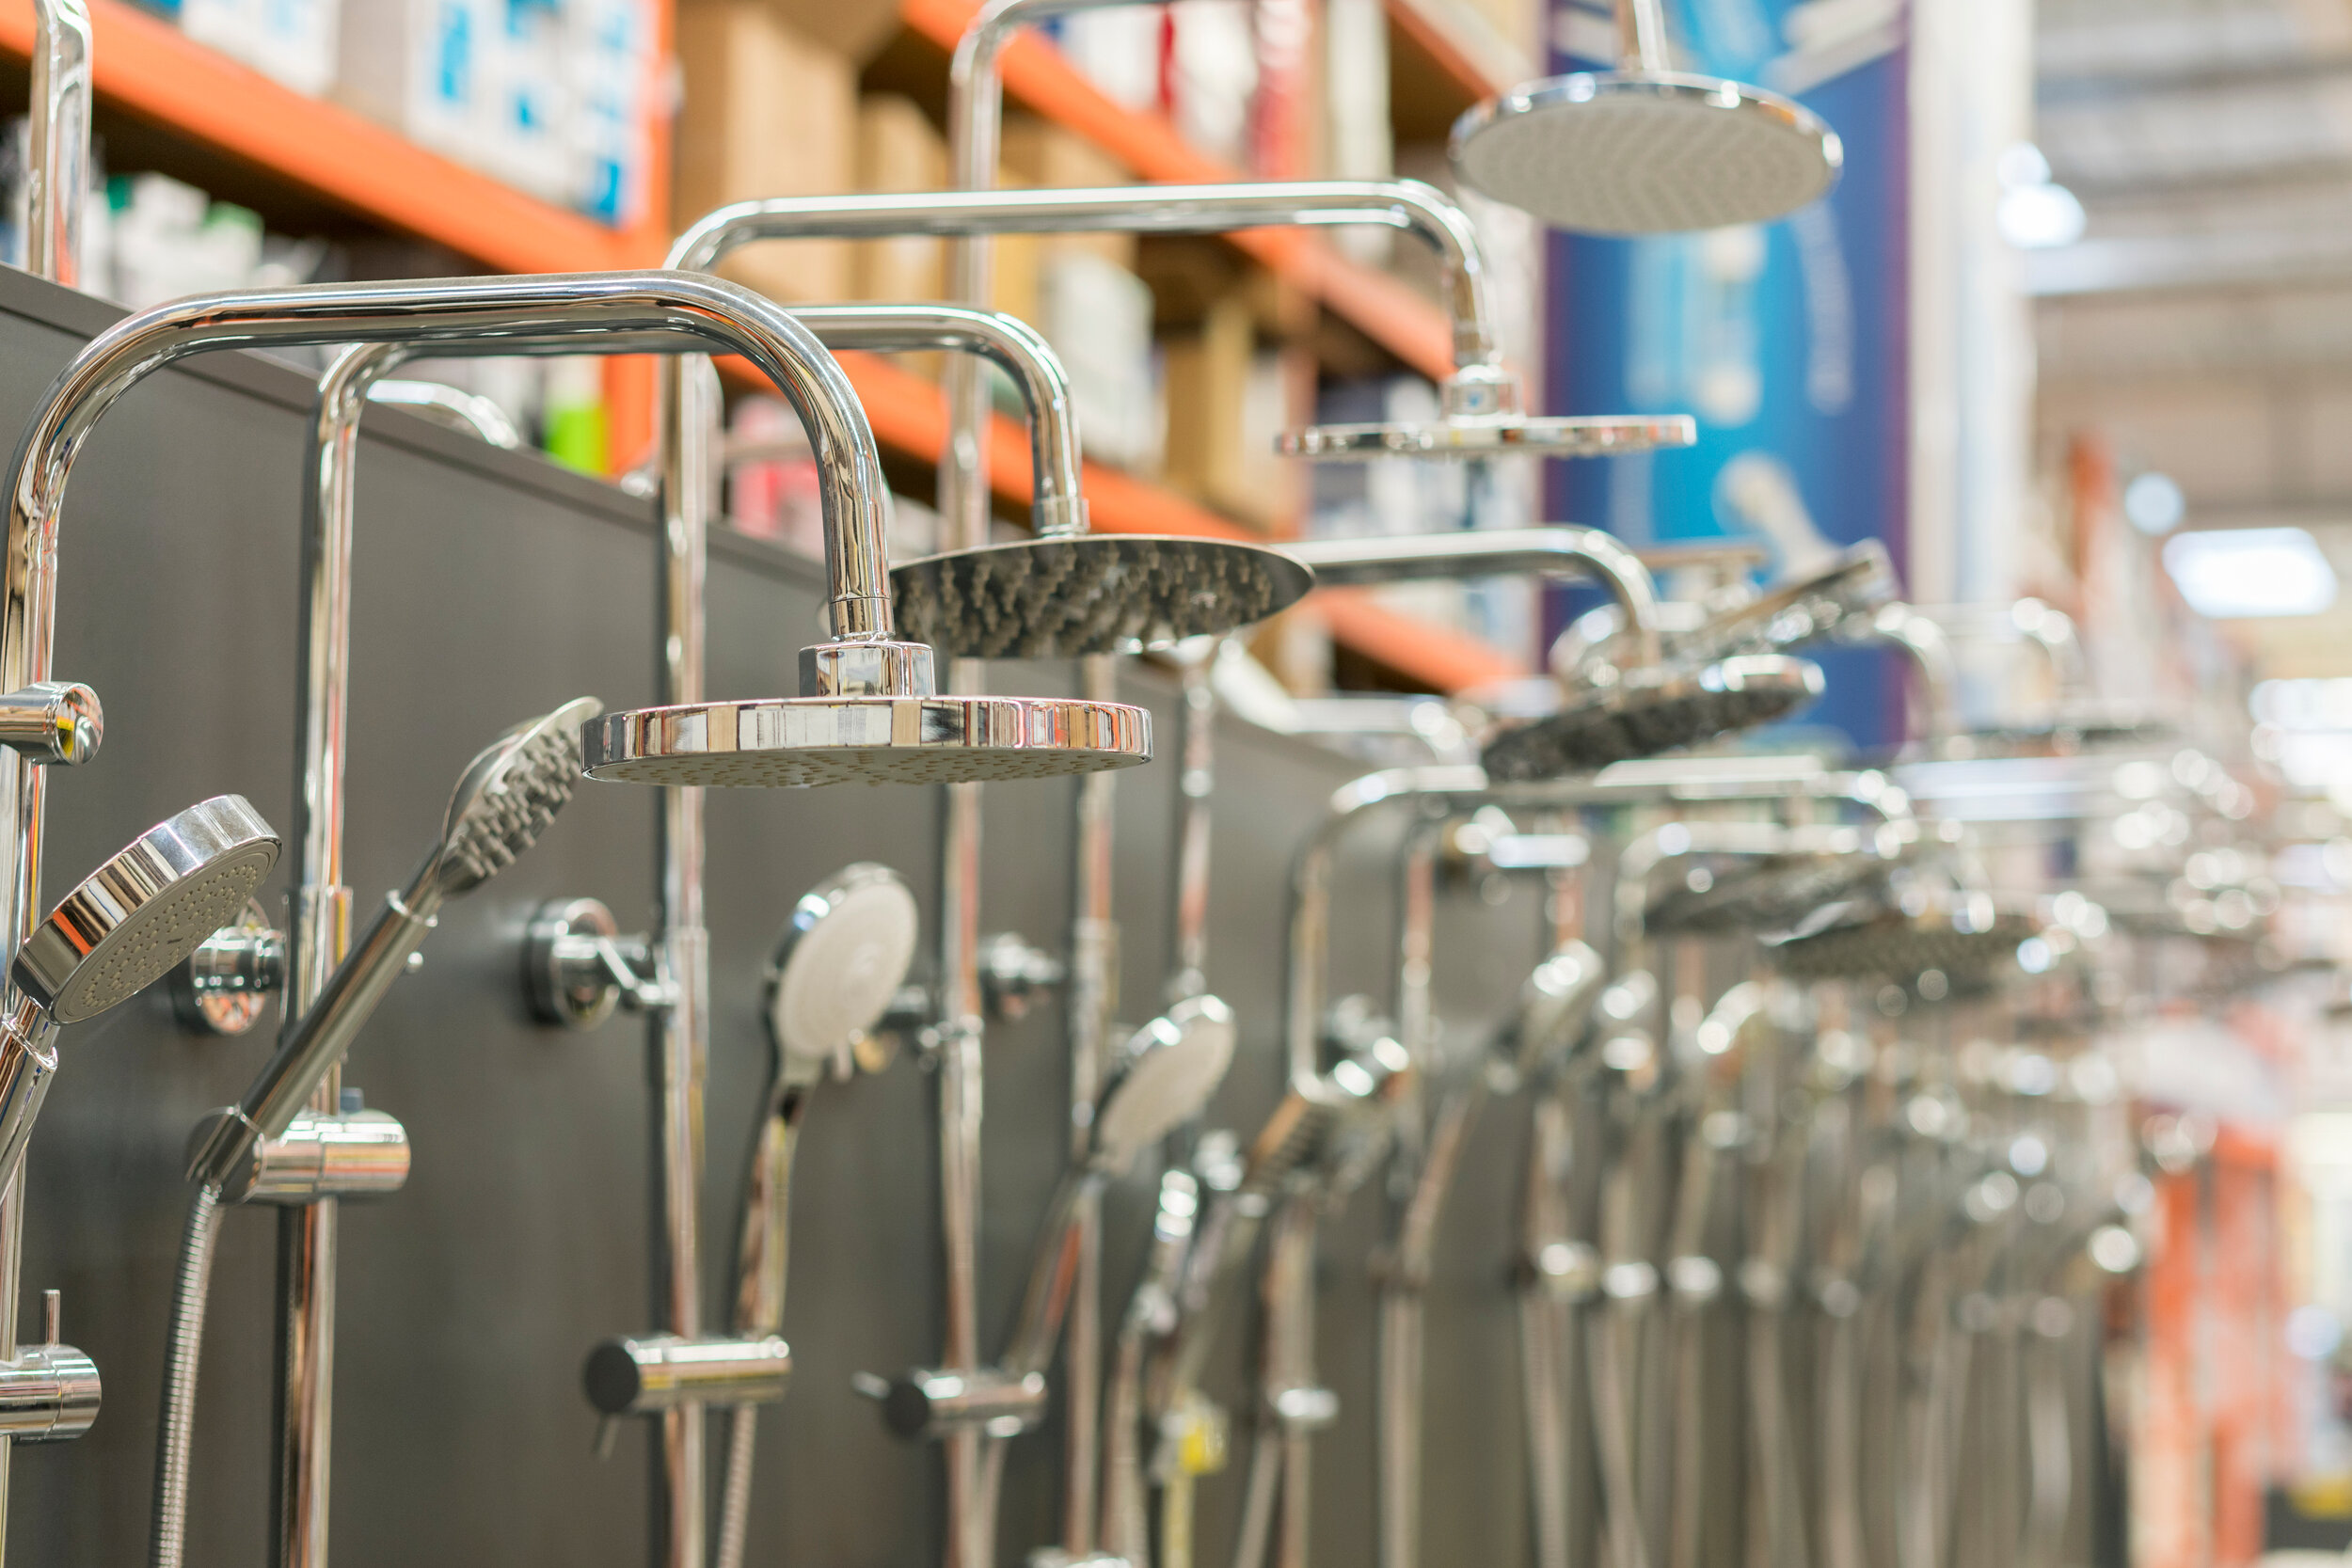 7 Mode Bathroom Chrome Water Saving Pressure HandHeld Fixed Shower Head